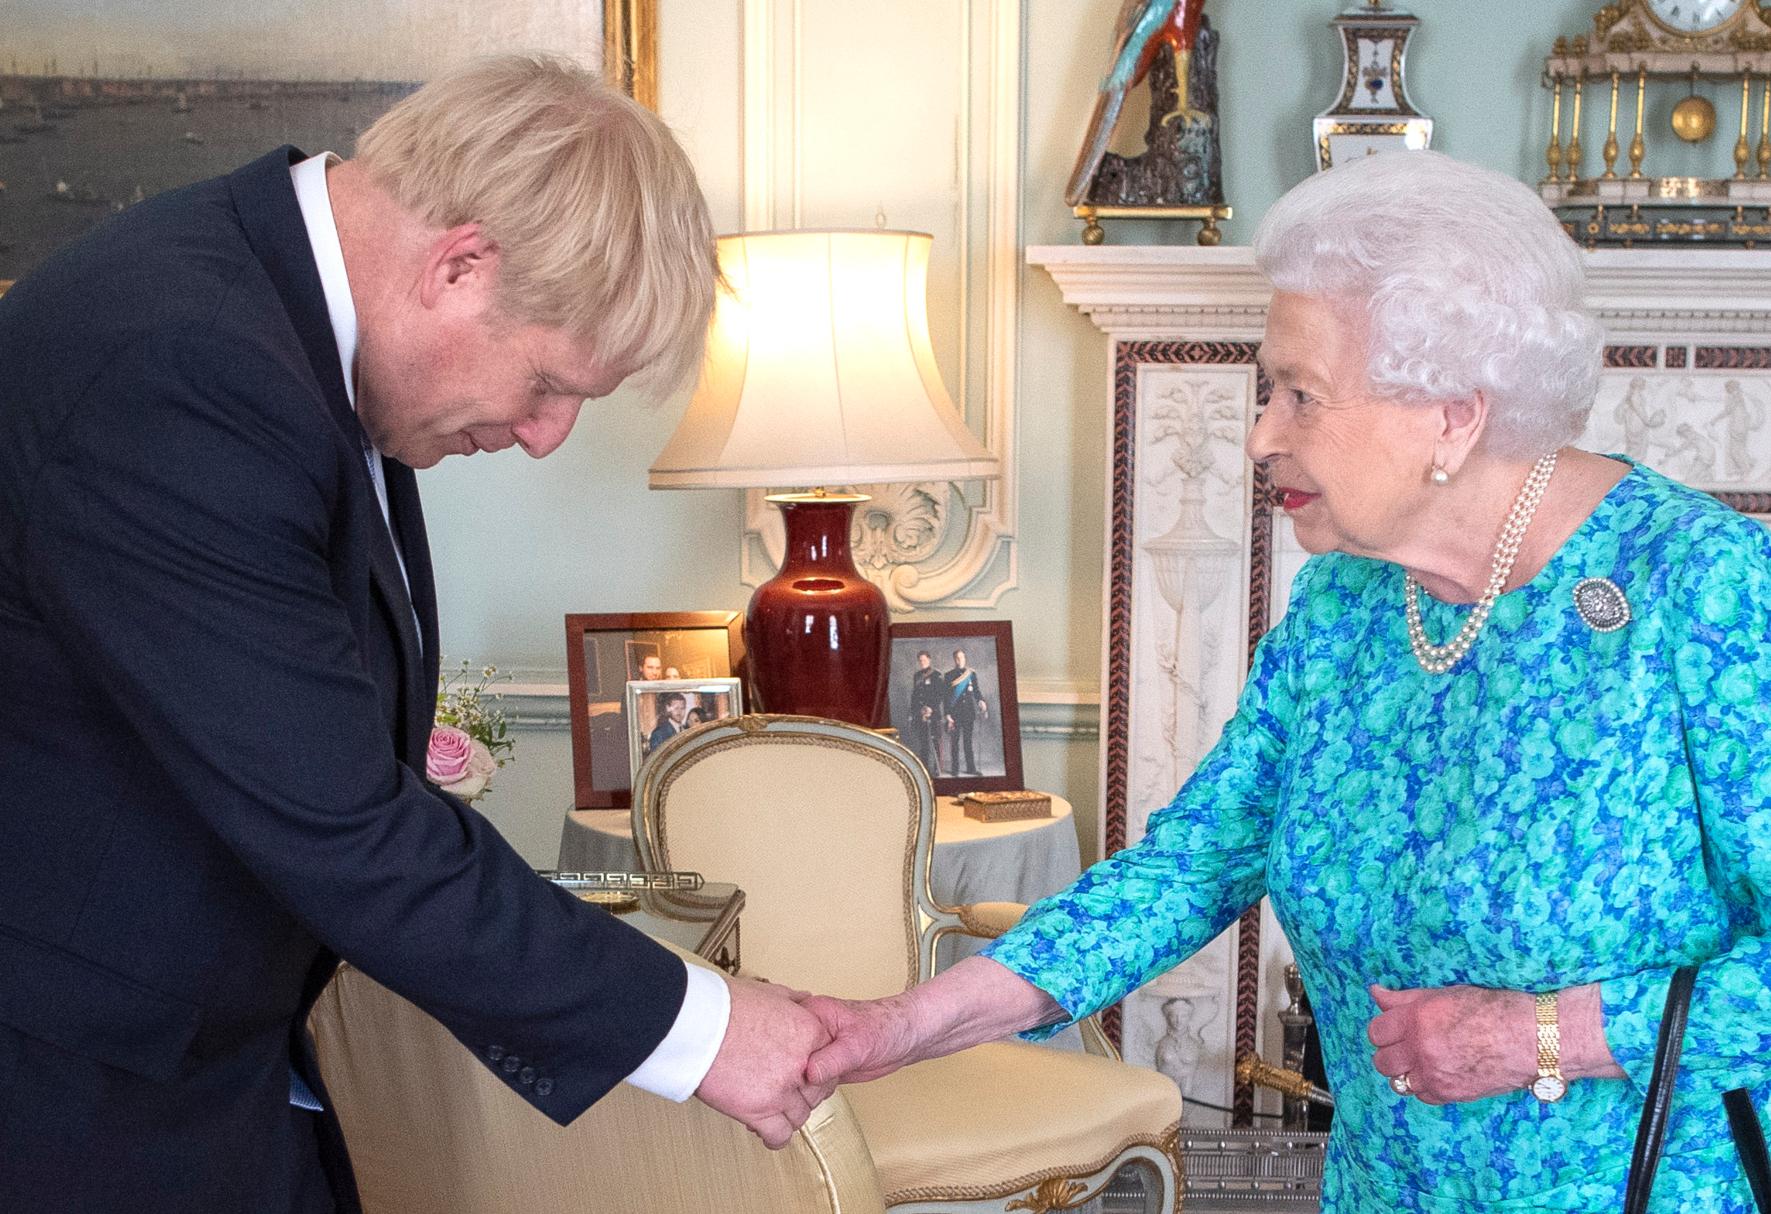 Rainhaboriszoom Fotografia De Meghan Markle E Harry Desaparece No Palácio De Buckingham